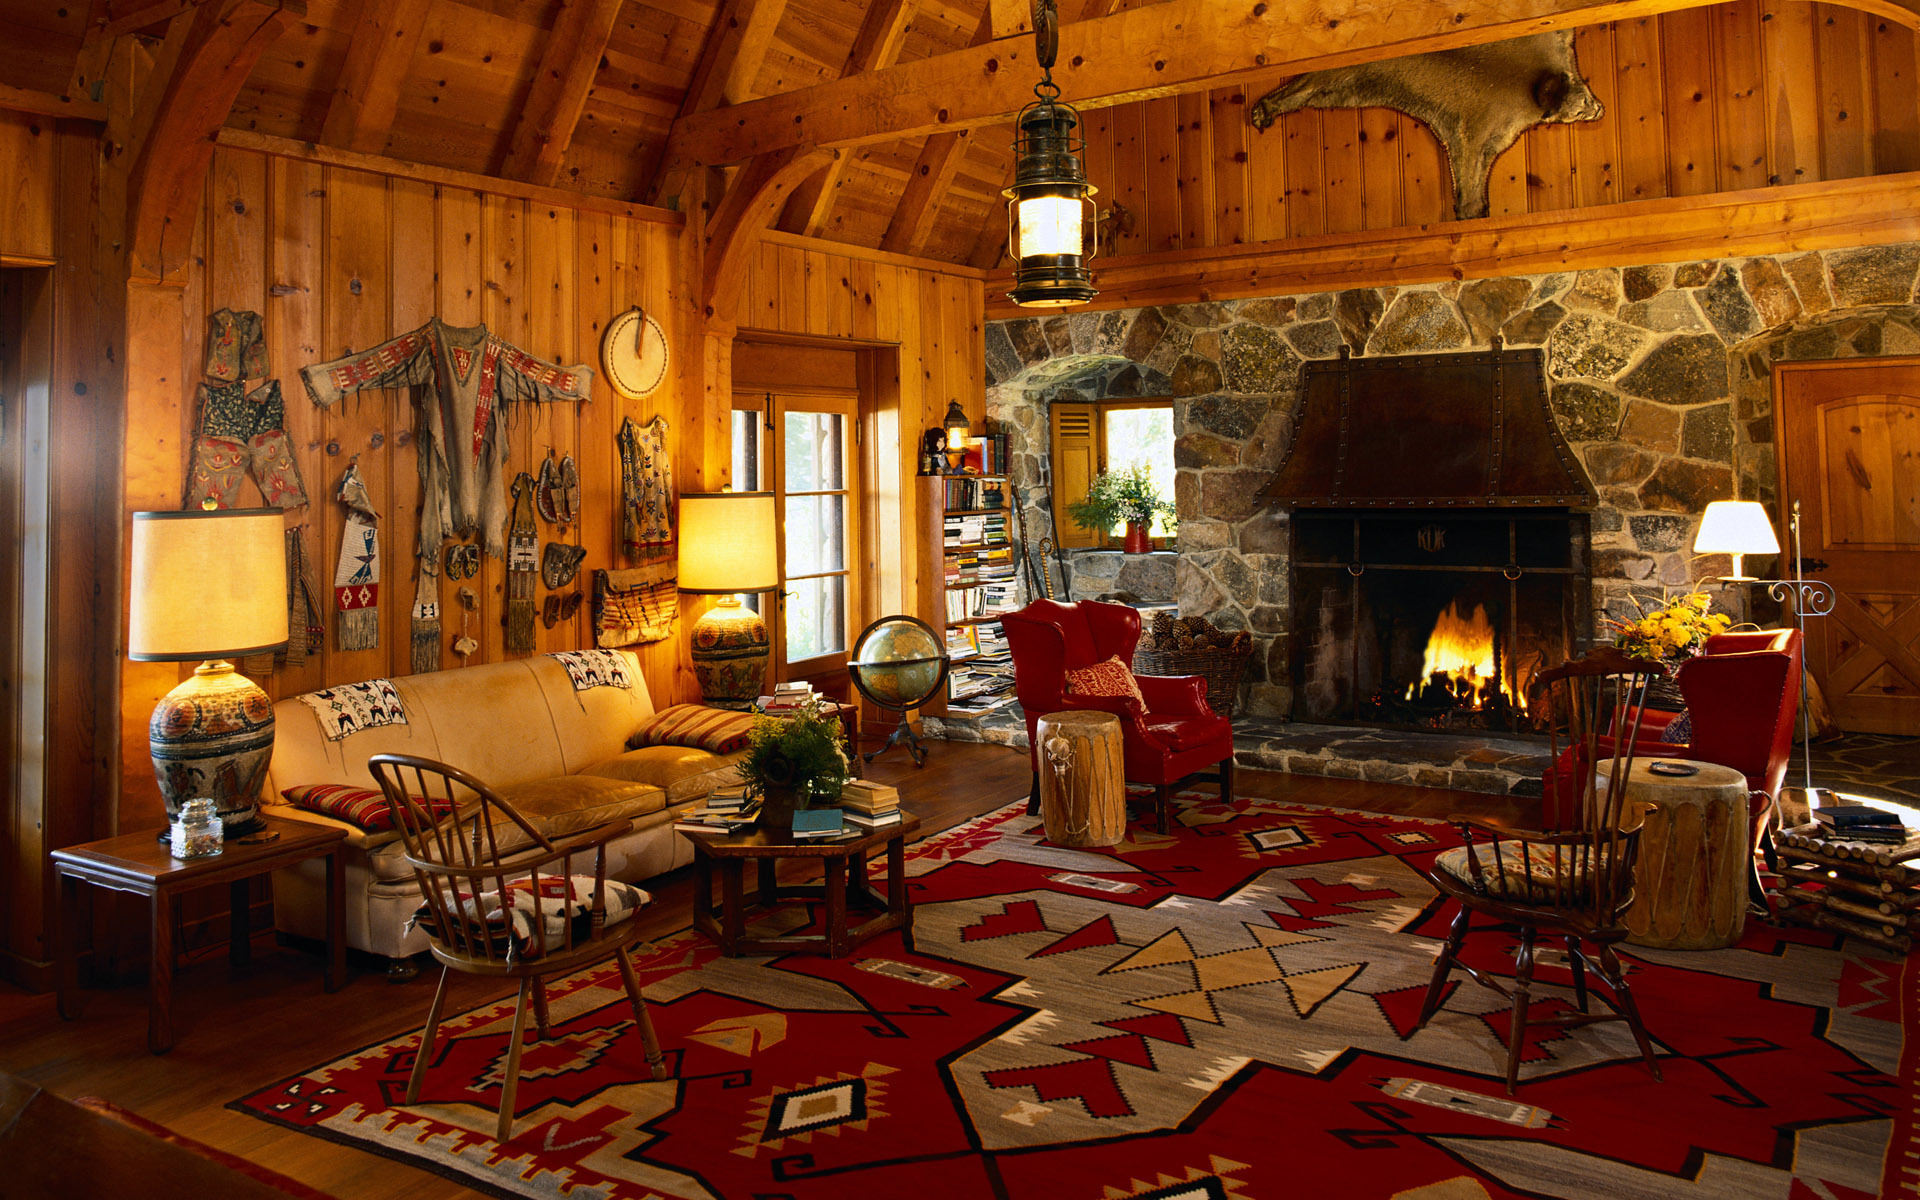 American Design with Log Cabin Wallpaper 1920 x 1200 764 kB jpeg 1920x1200